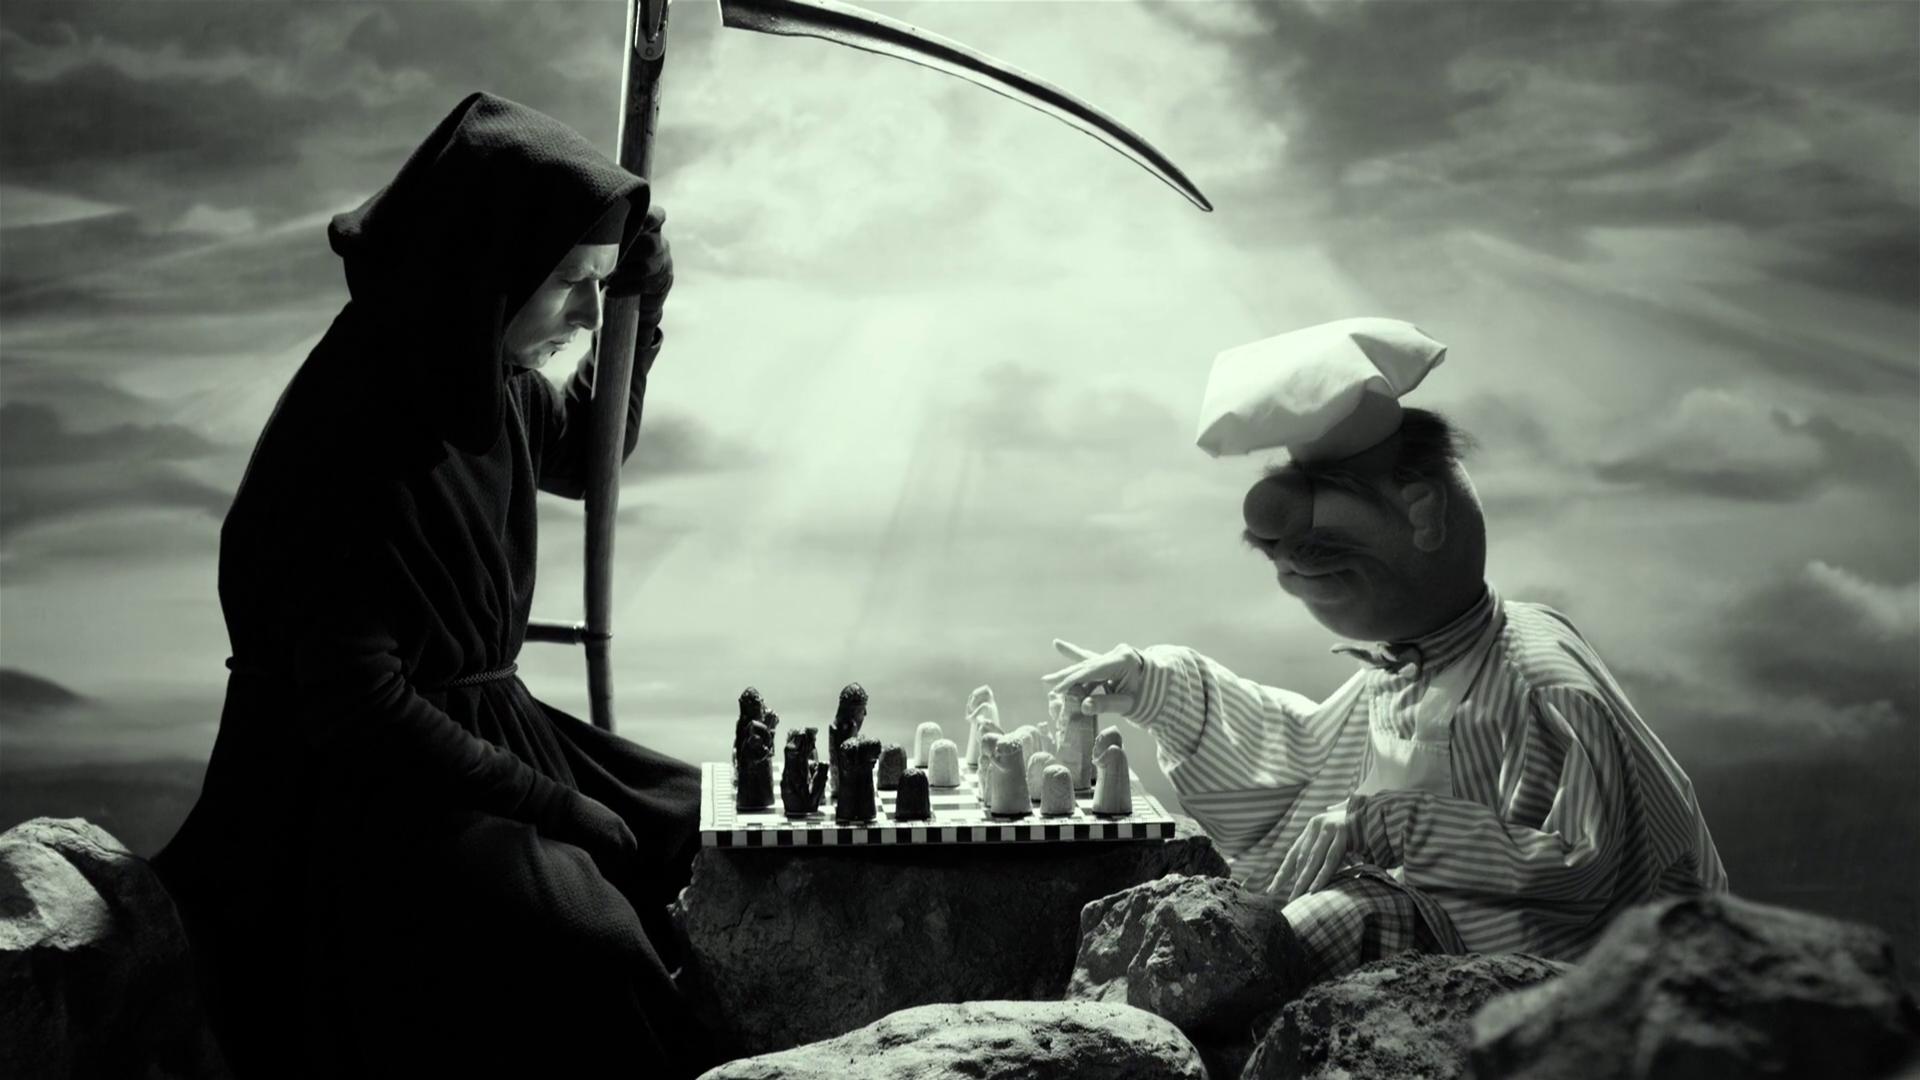 digital art Grim Reaper death dark scythe monochrome chess board games rock sunlight clouds cook hoods